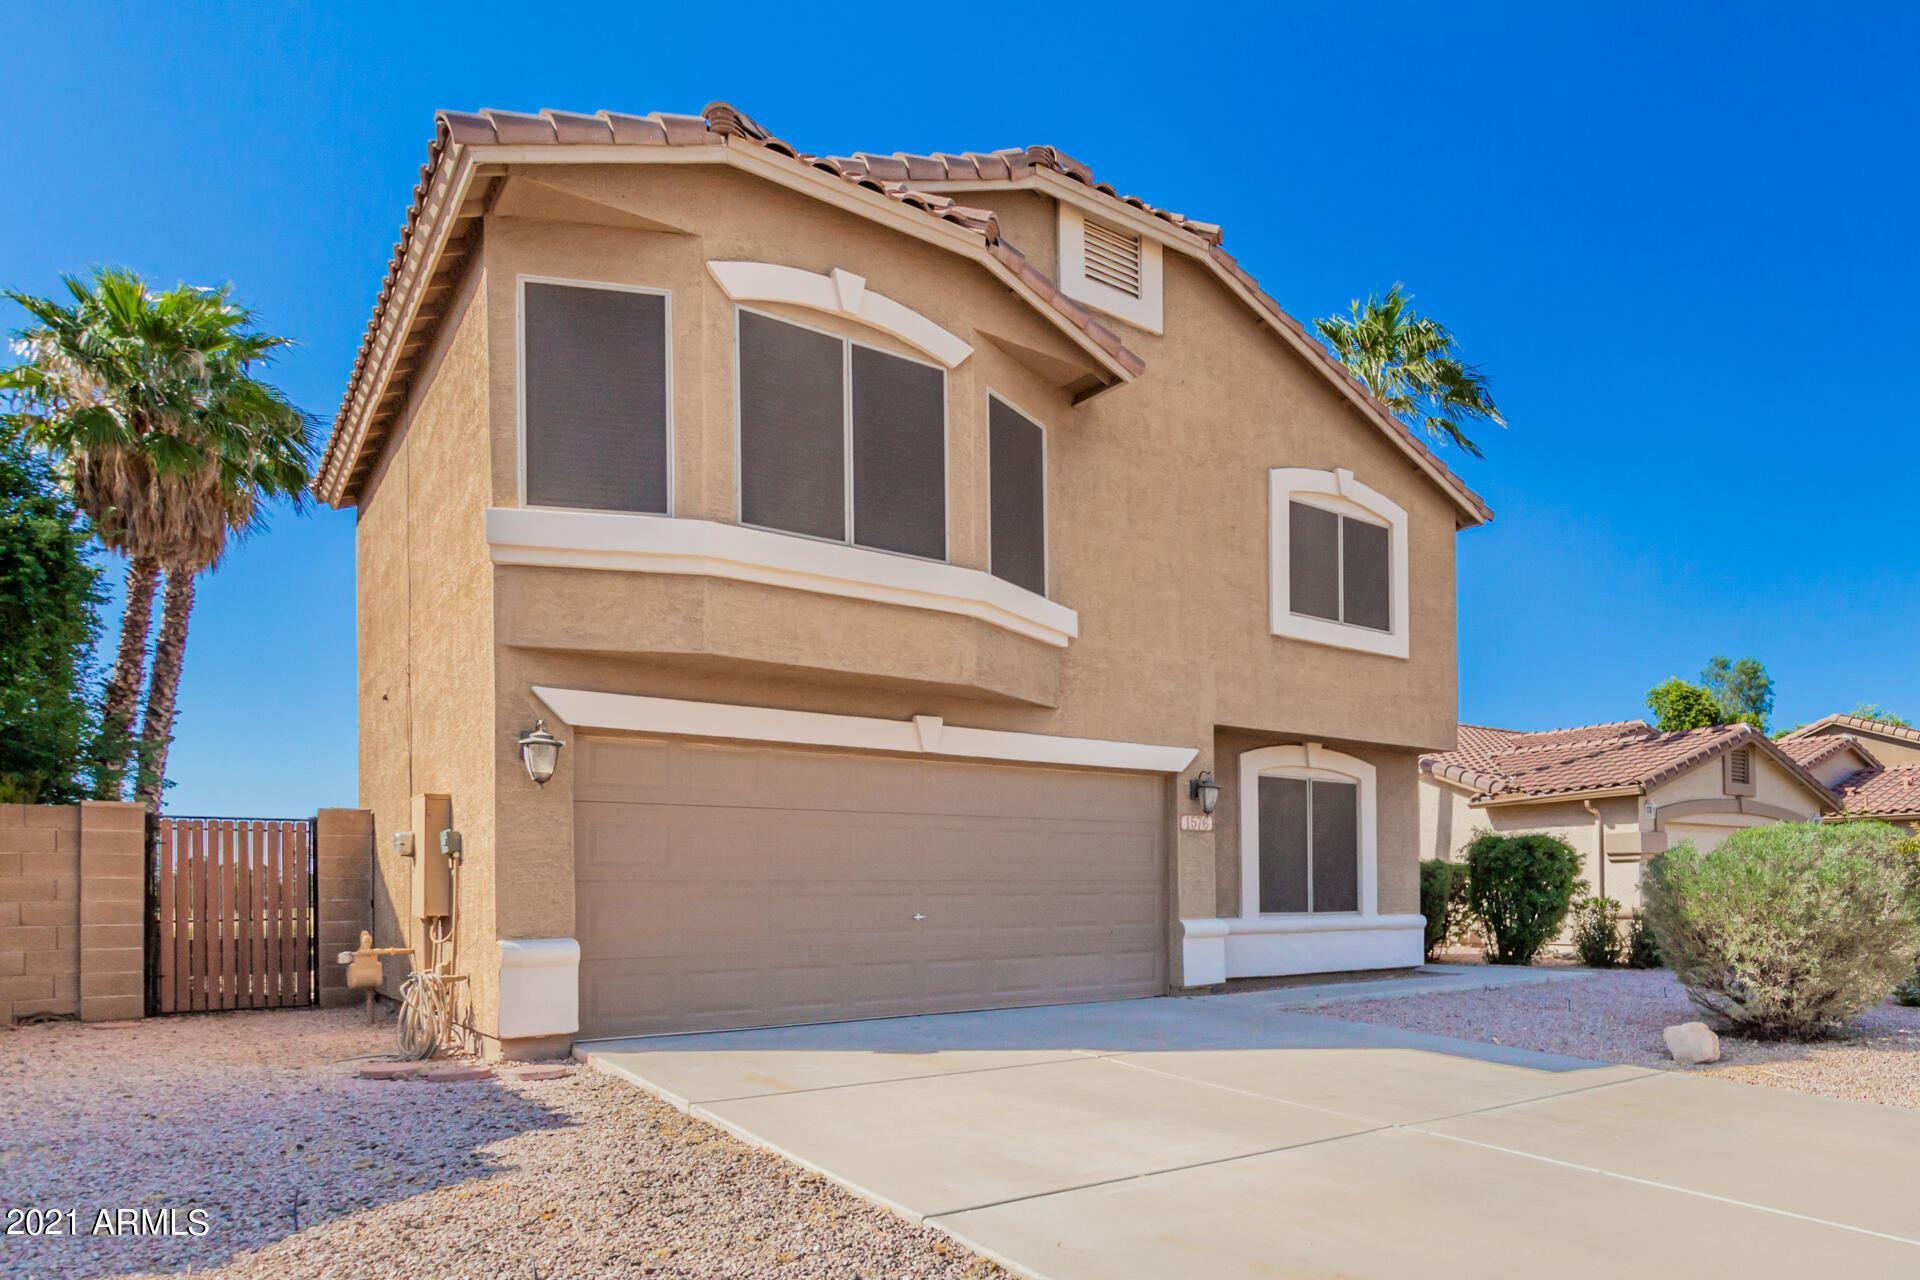 Photo of 1576 S WESTERN SKIES Drive, Gilbert, AZ 85296 (MLS # 6307668)